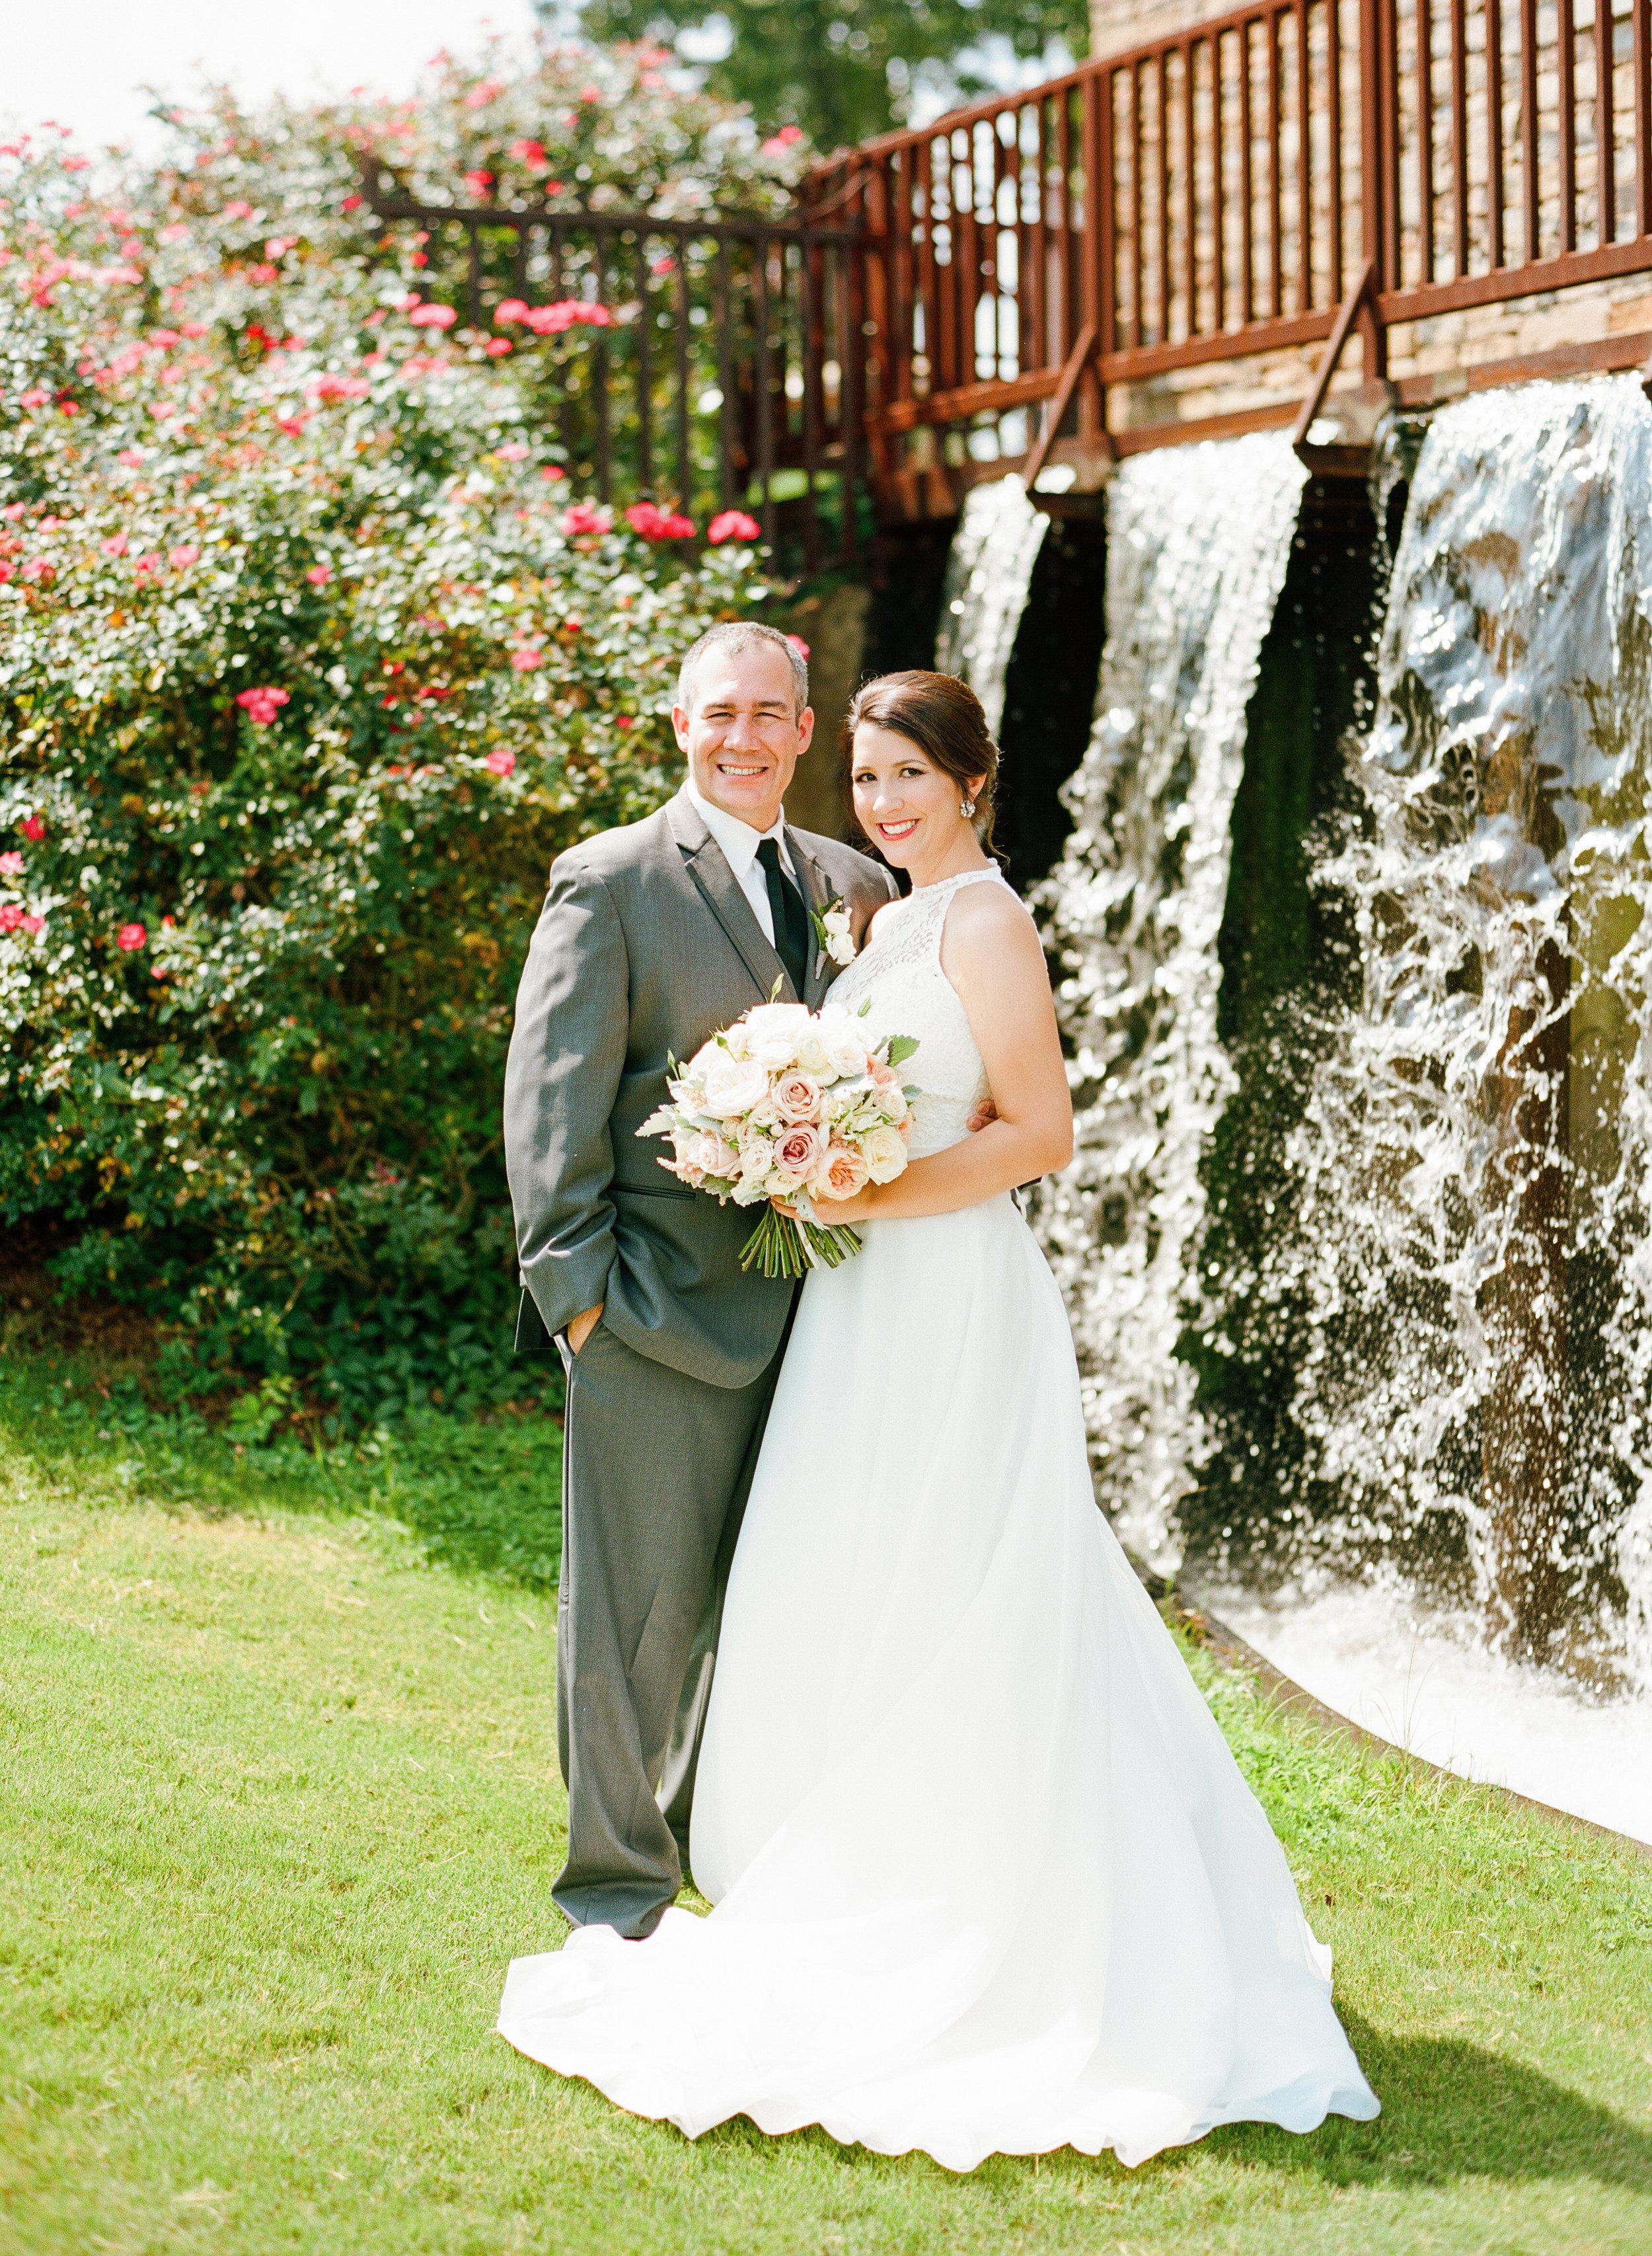 Negre Wedding-Portraits-0007.jpg